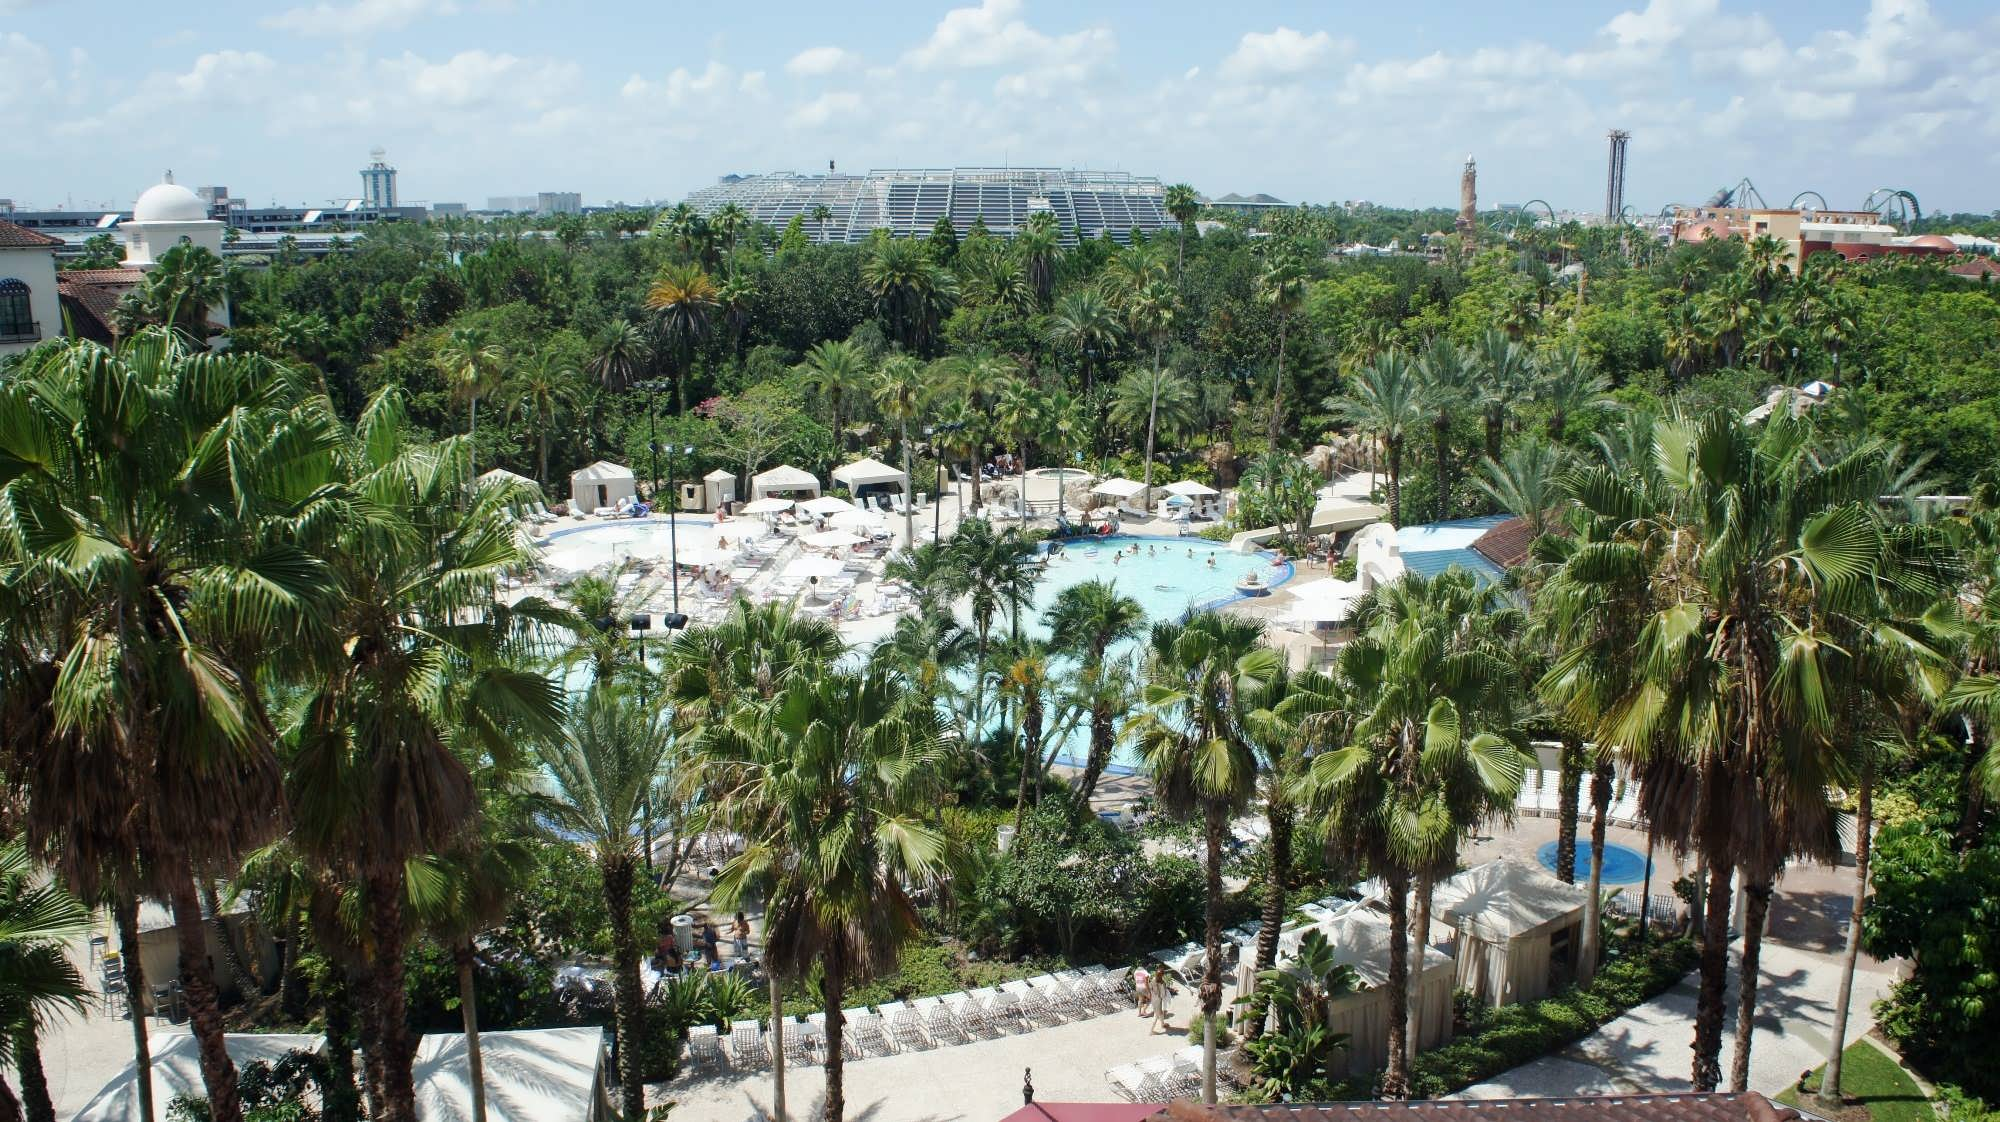 Hard Rock Orlando pool view